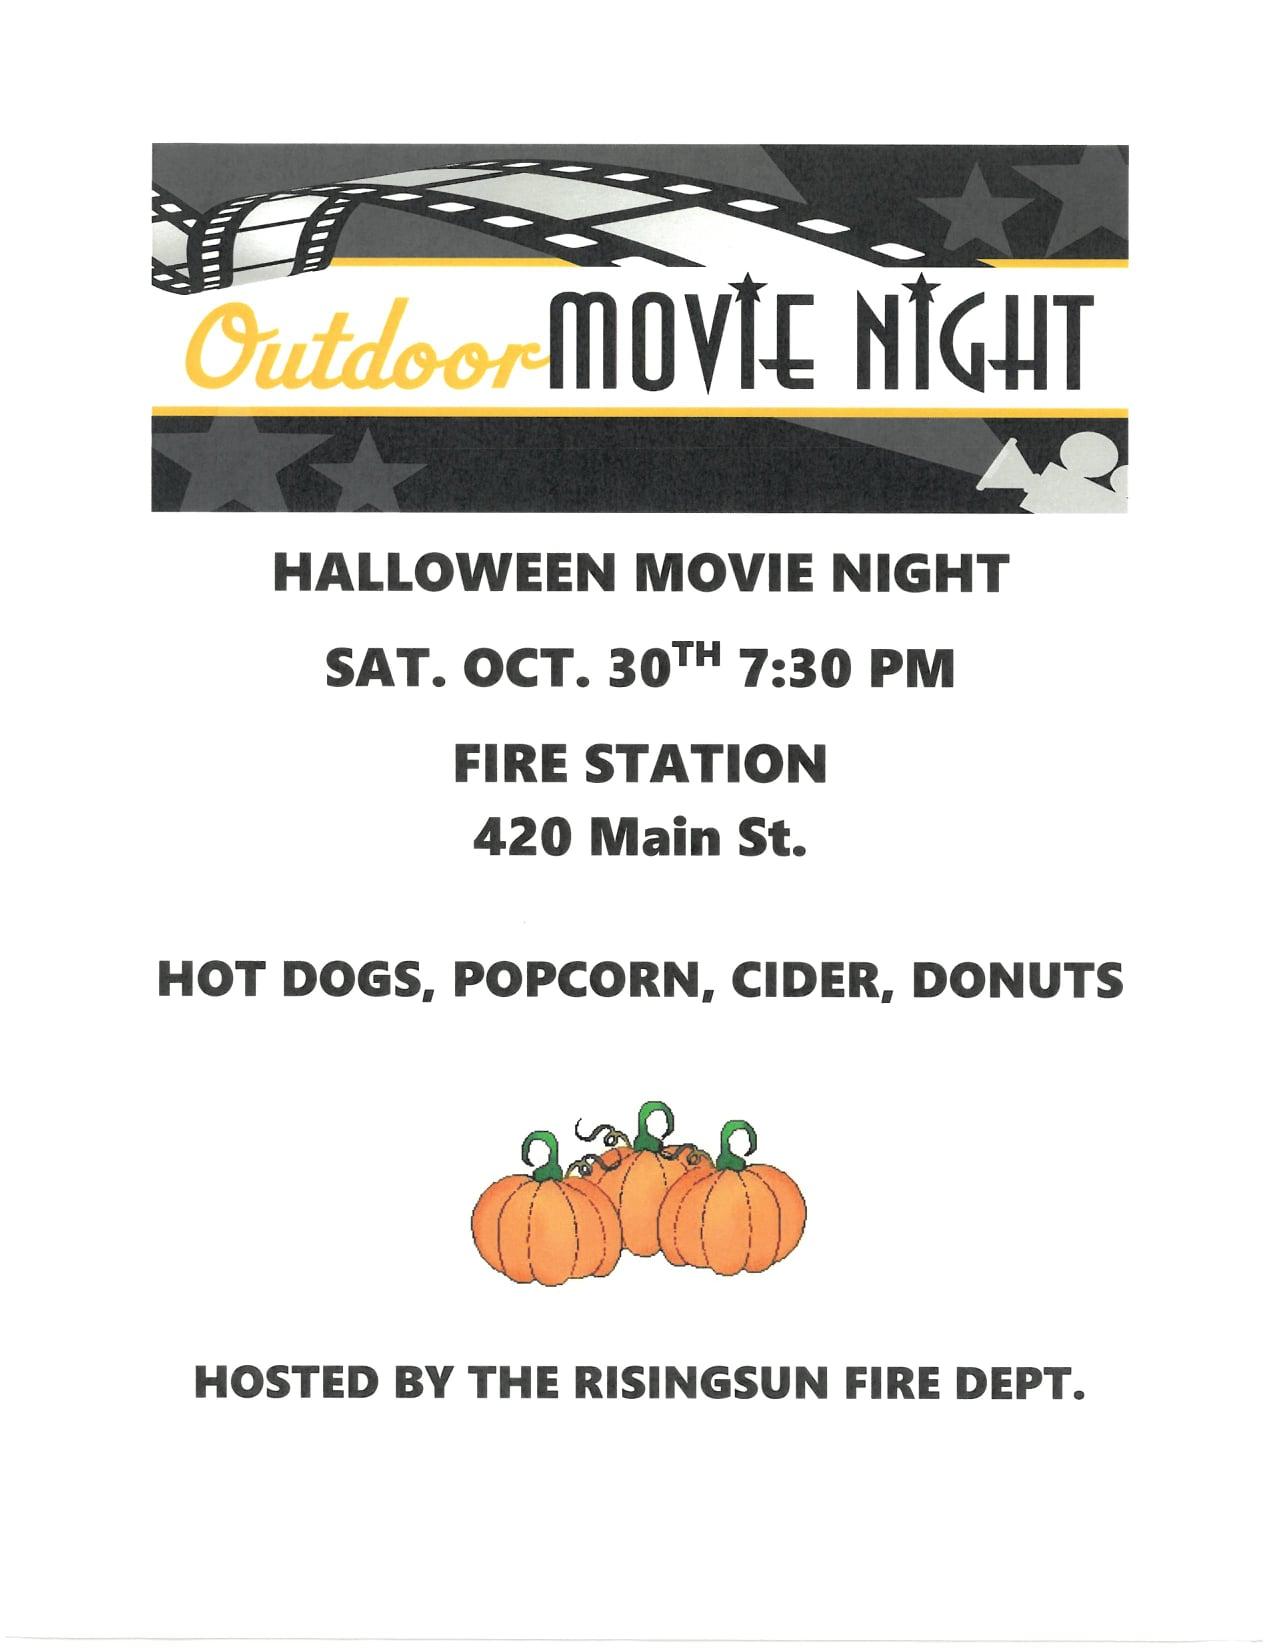 Fire Department Movie Night